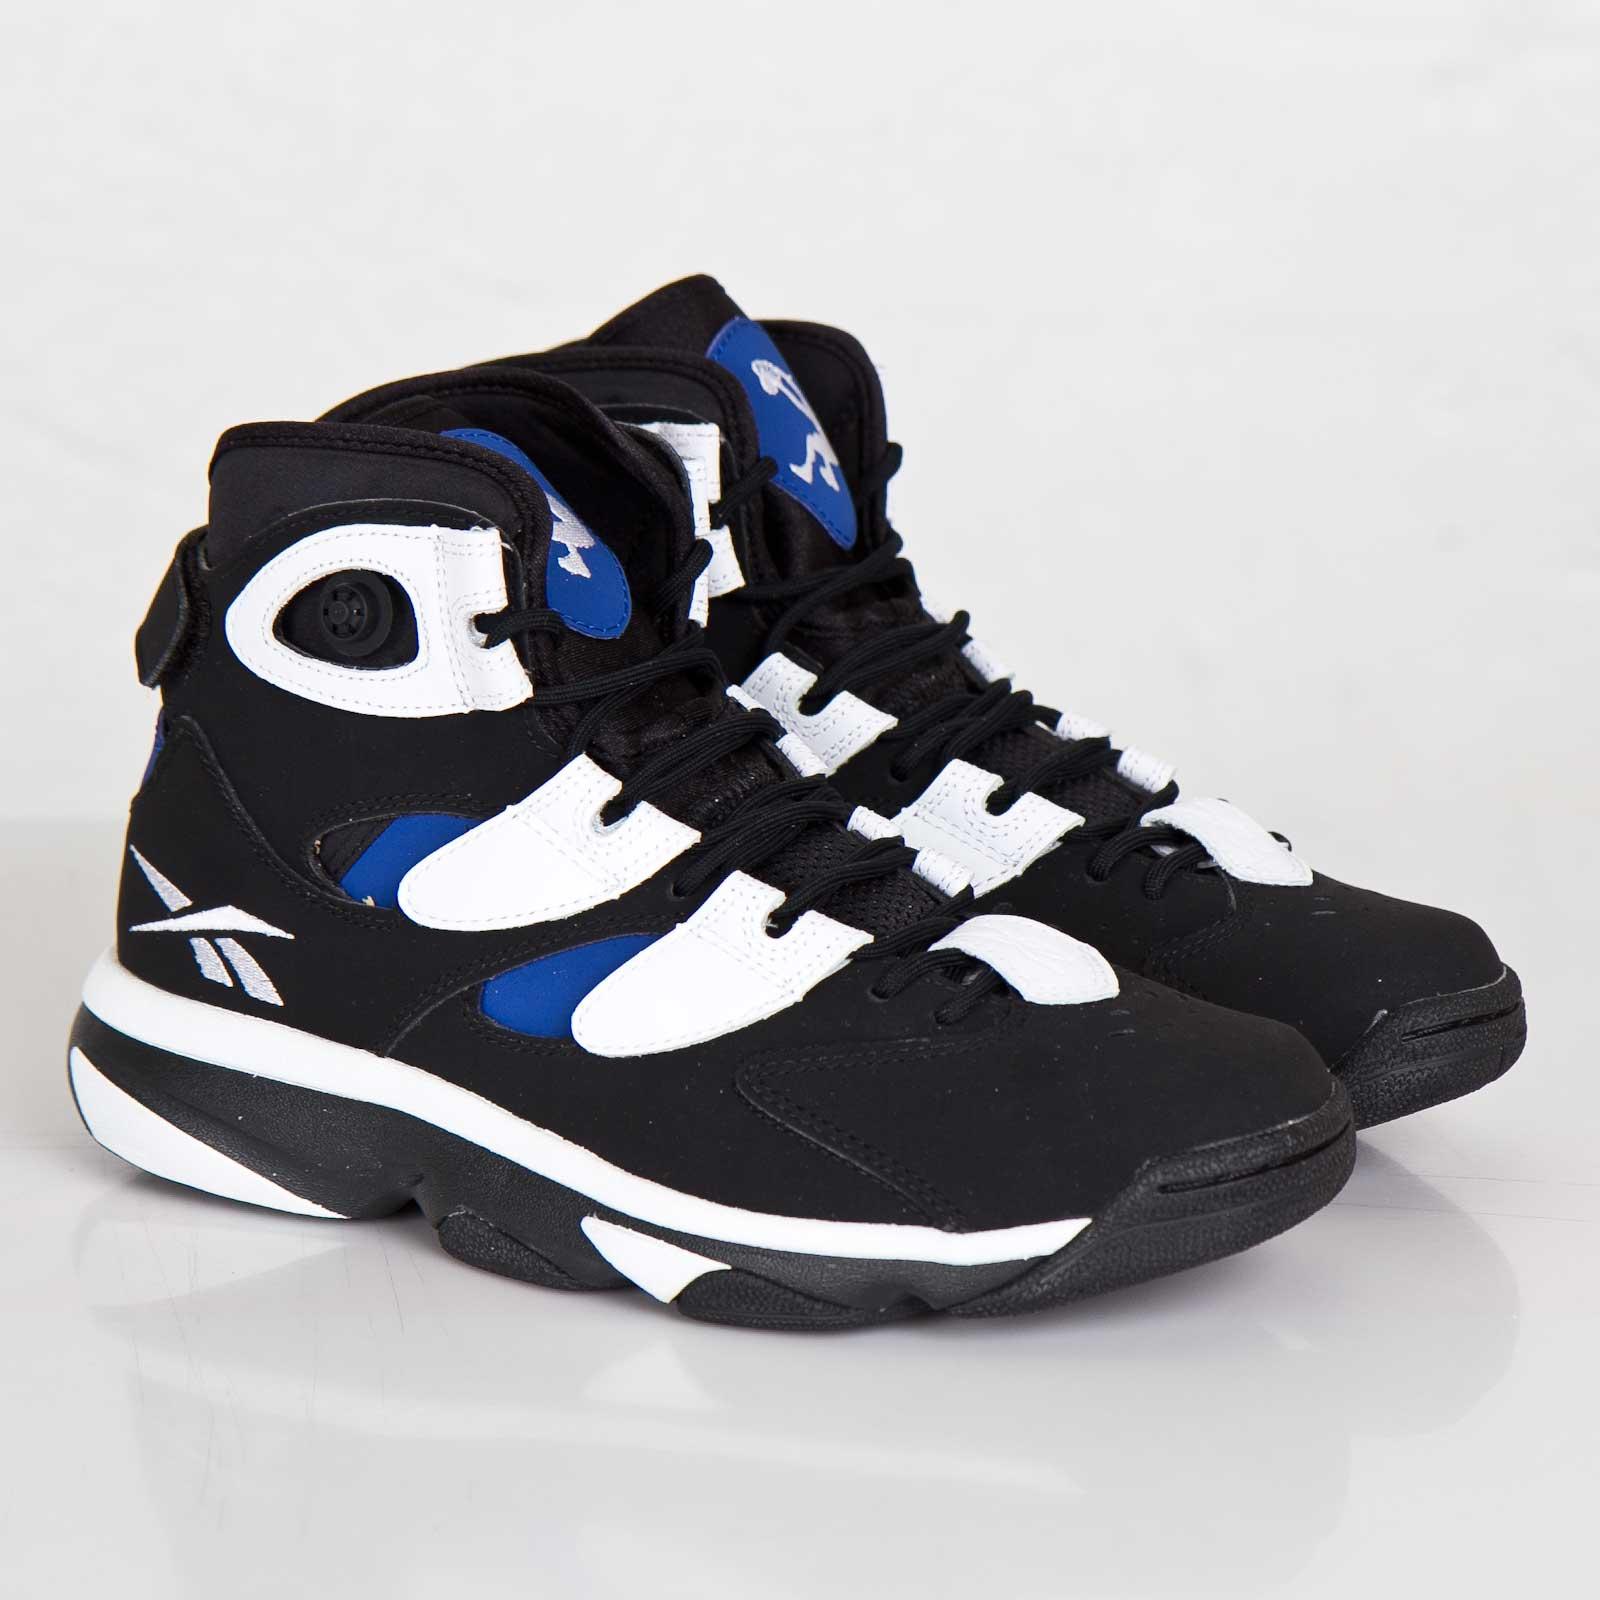 880ace2e7a9 Reebok Shaq Attaq IV - M41972 - Sneakersnstuff